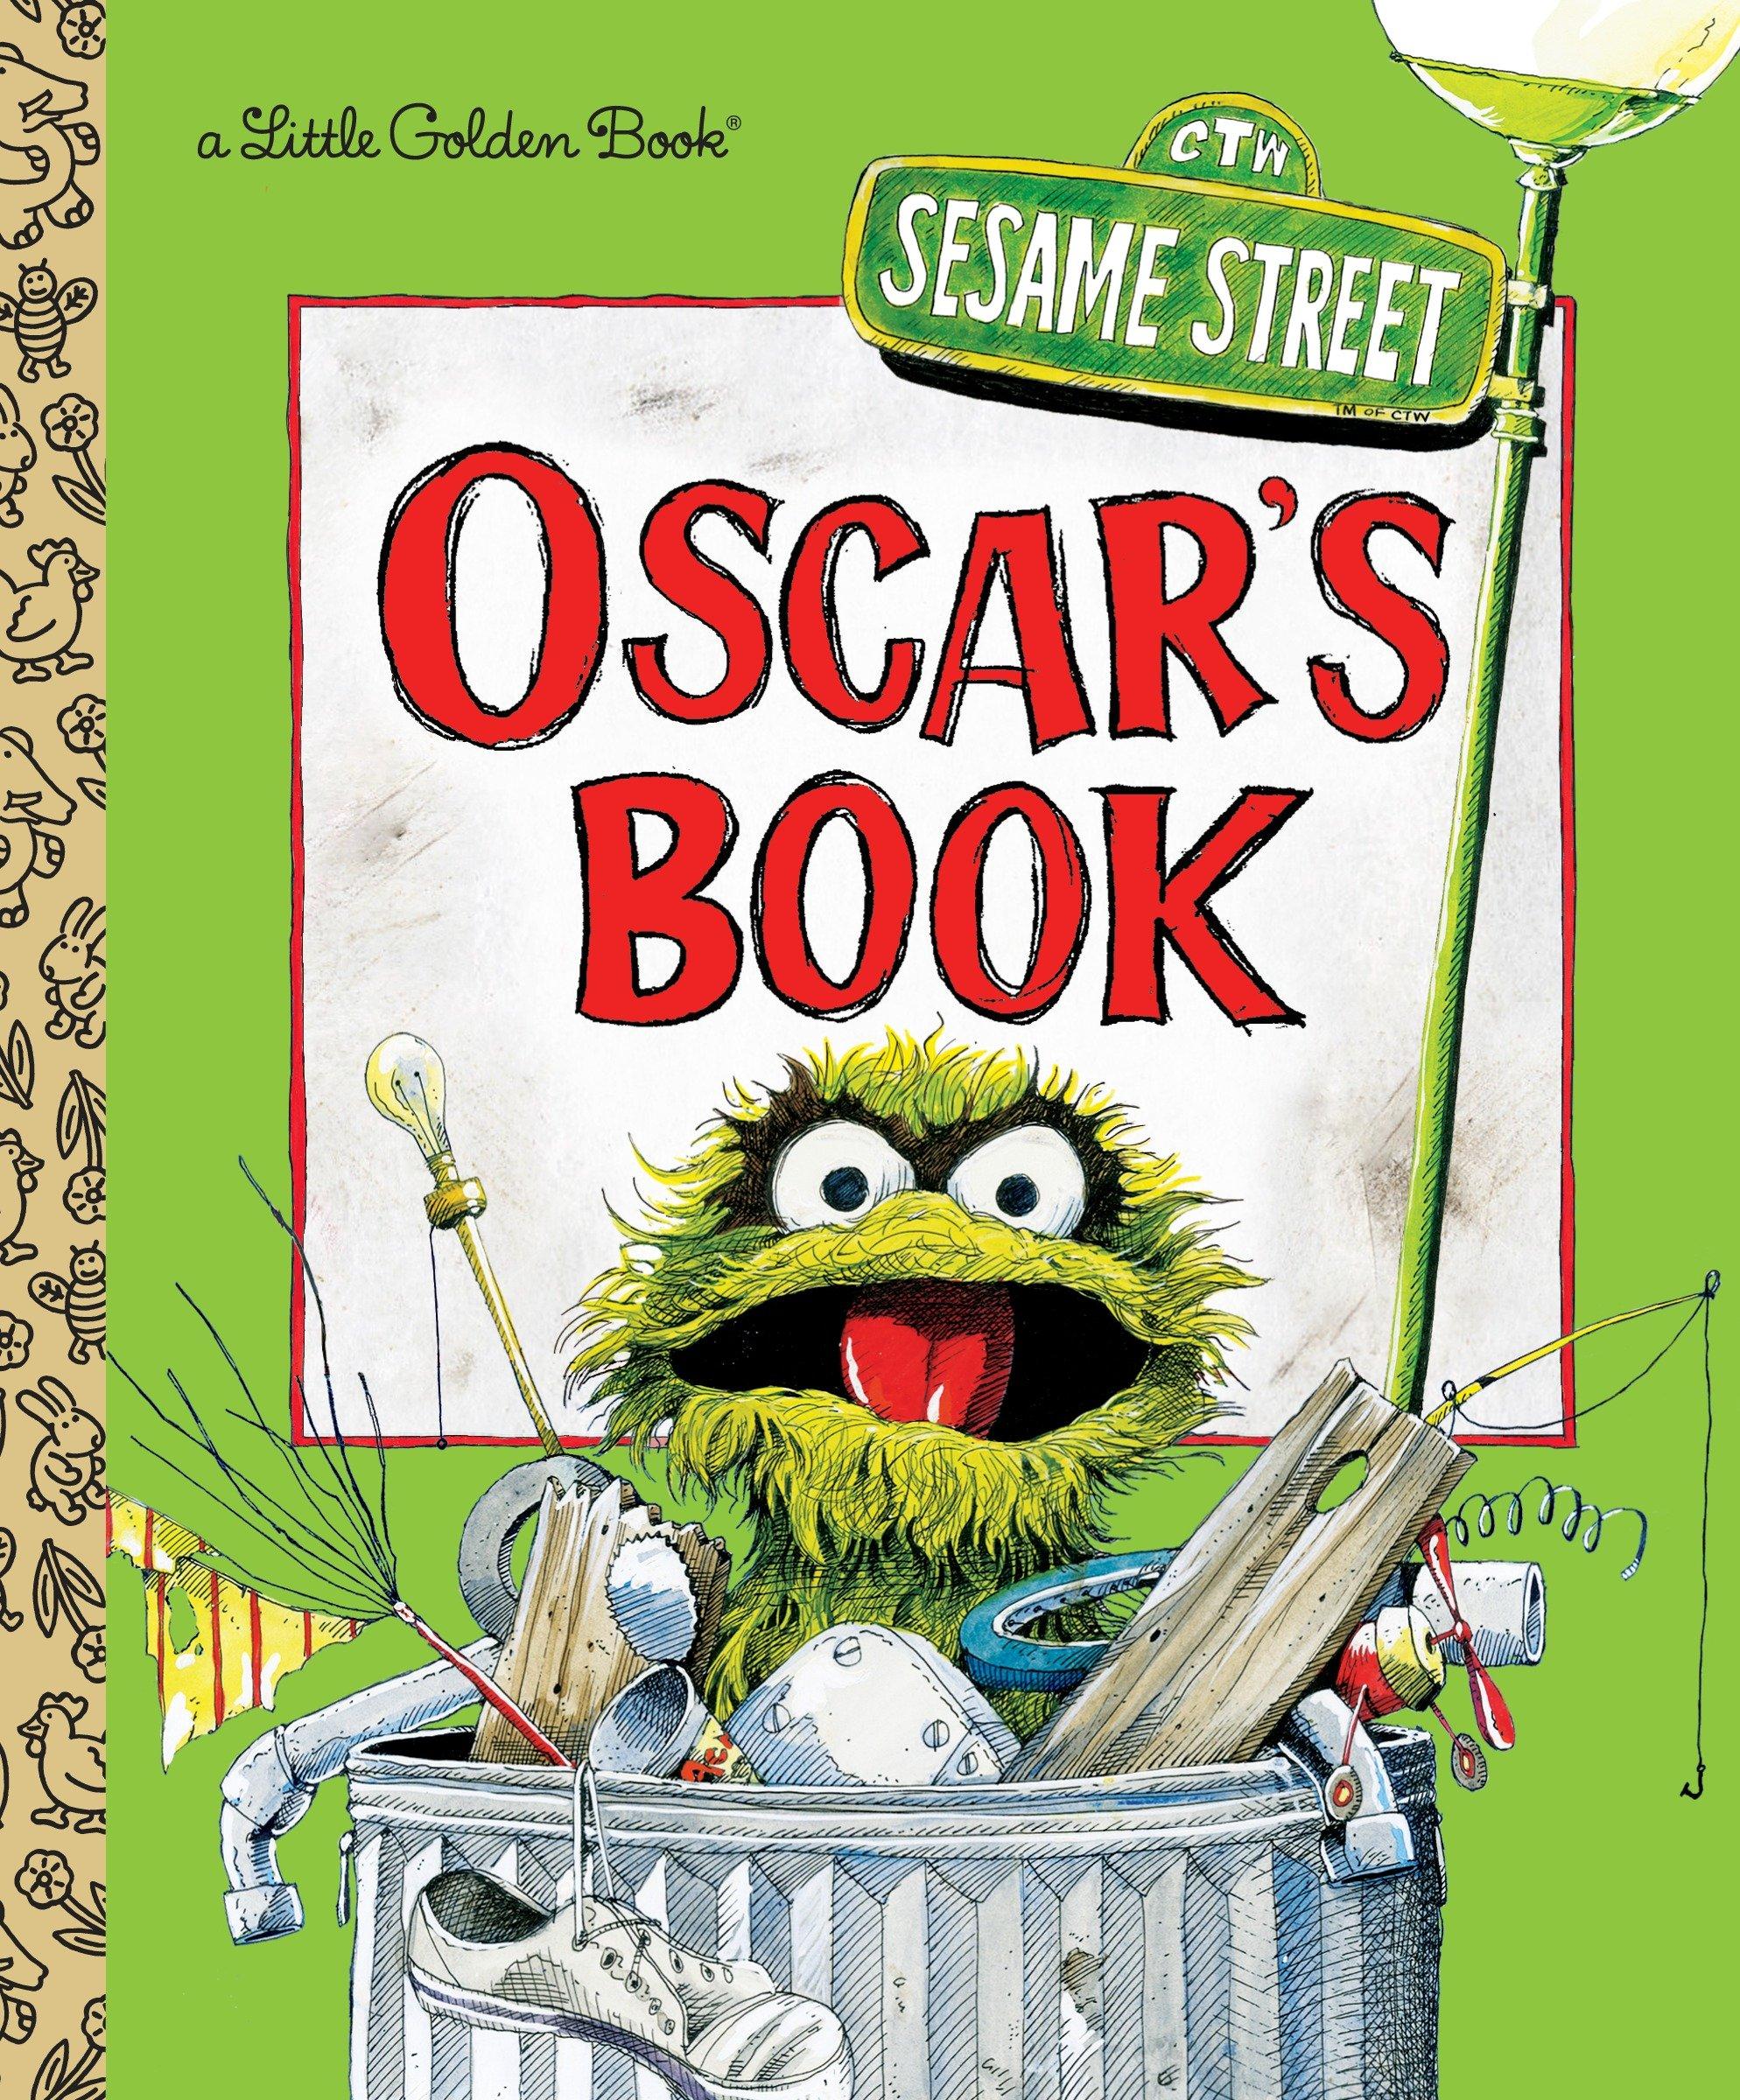 Oscar's Book (Sesame Street)